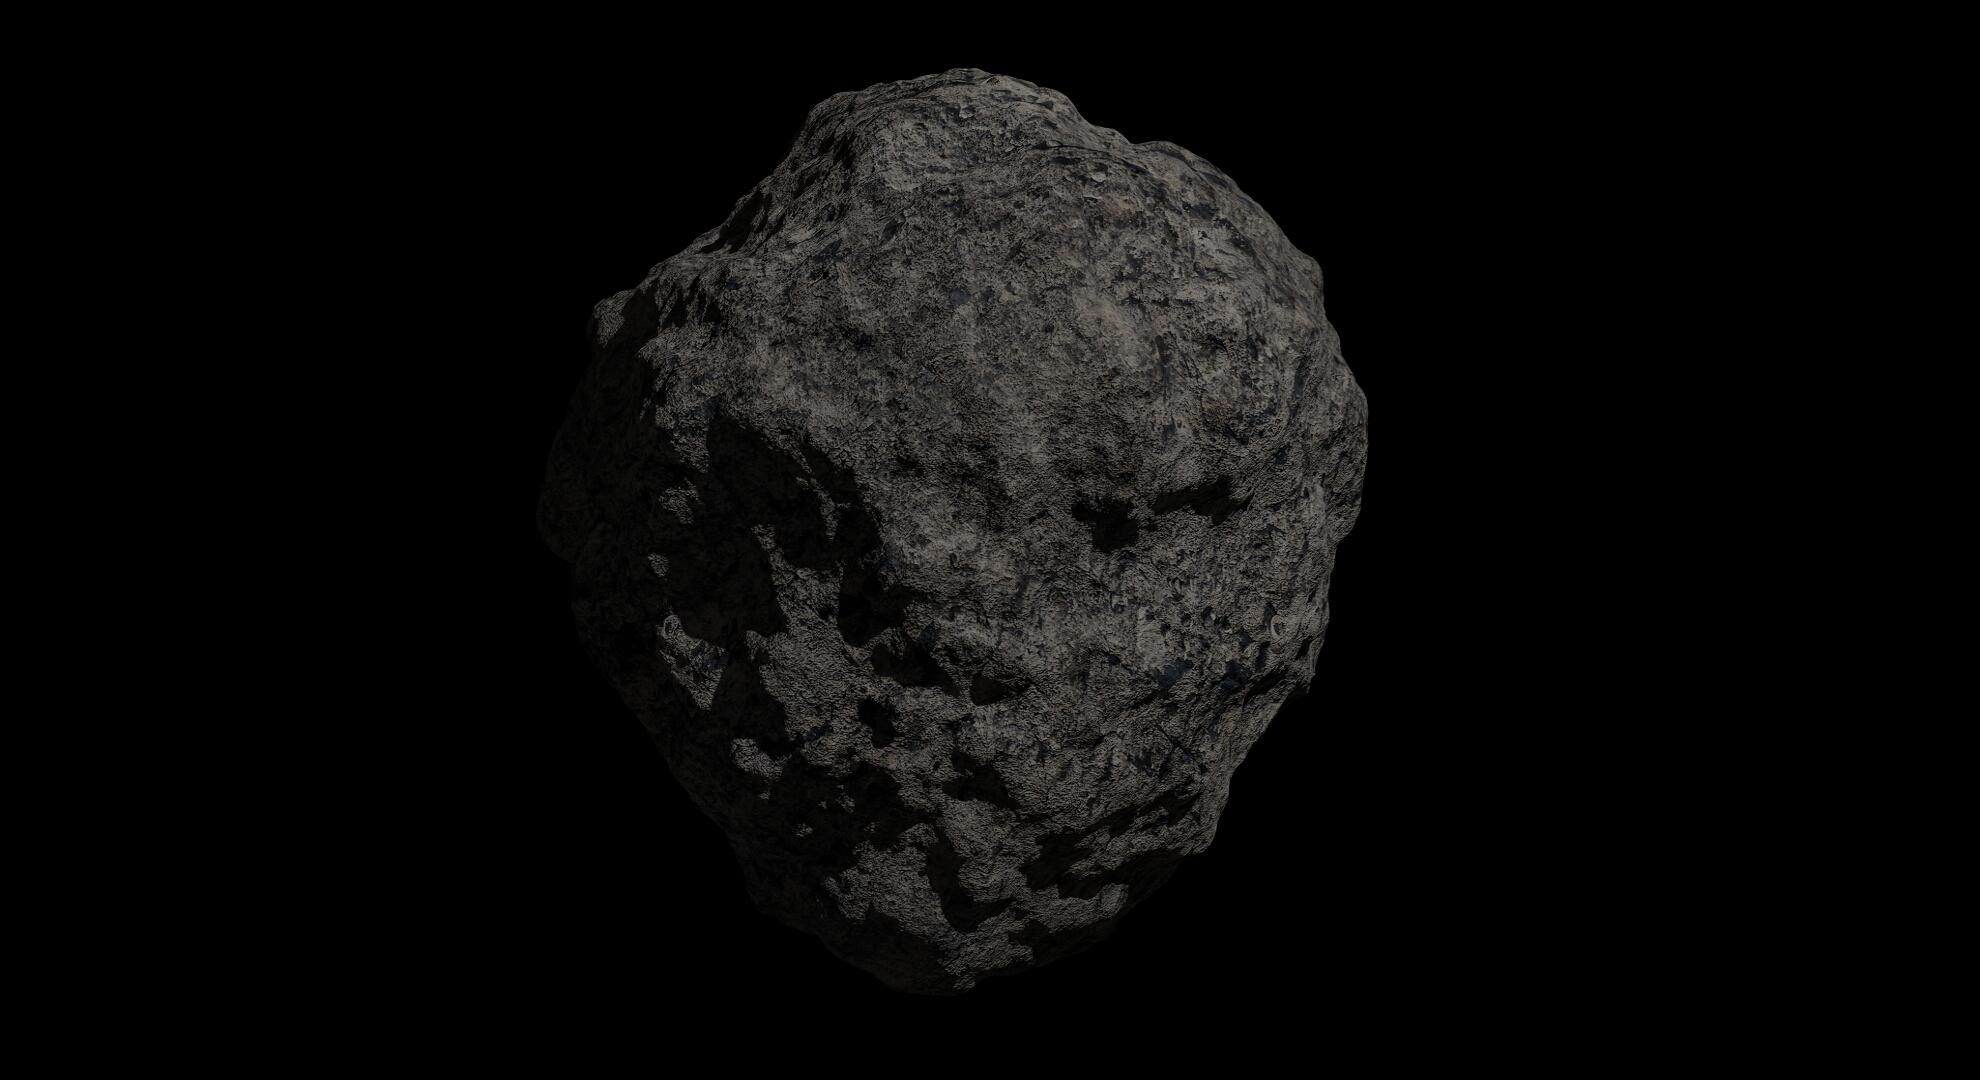 fantasy asteroid 2 3d model 3ds blend dae fbx obj 267198